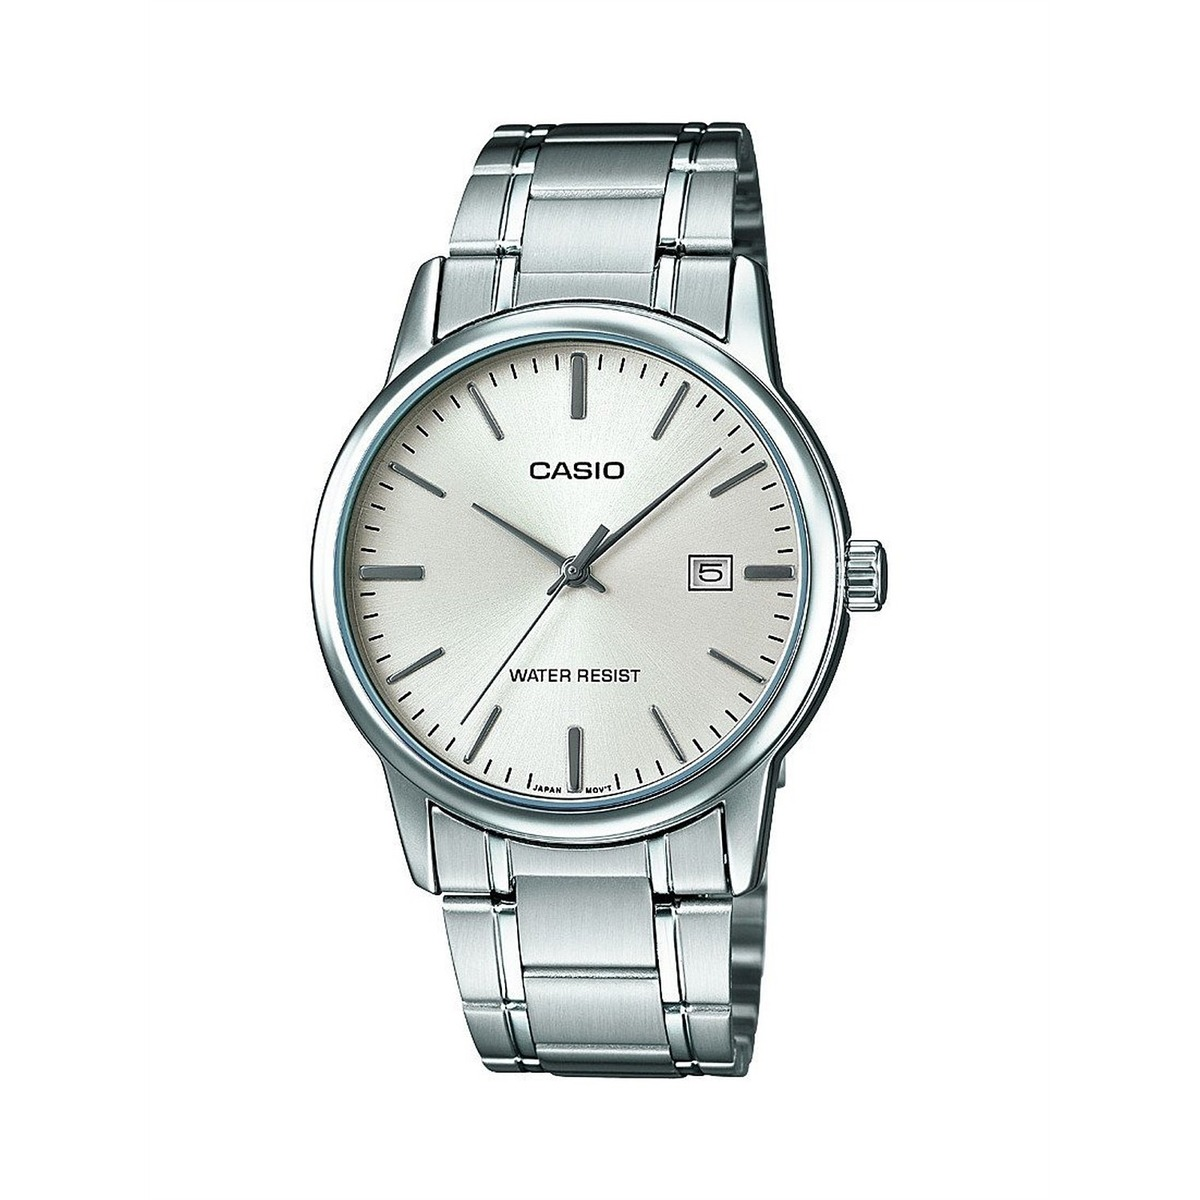 390f9380f0c Relógio Casio Collection Analógico Feminino Ltp-v002d-7audf